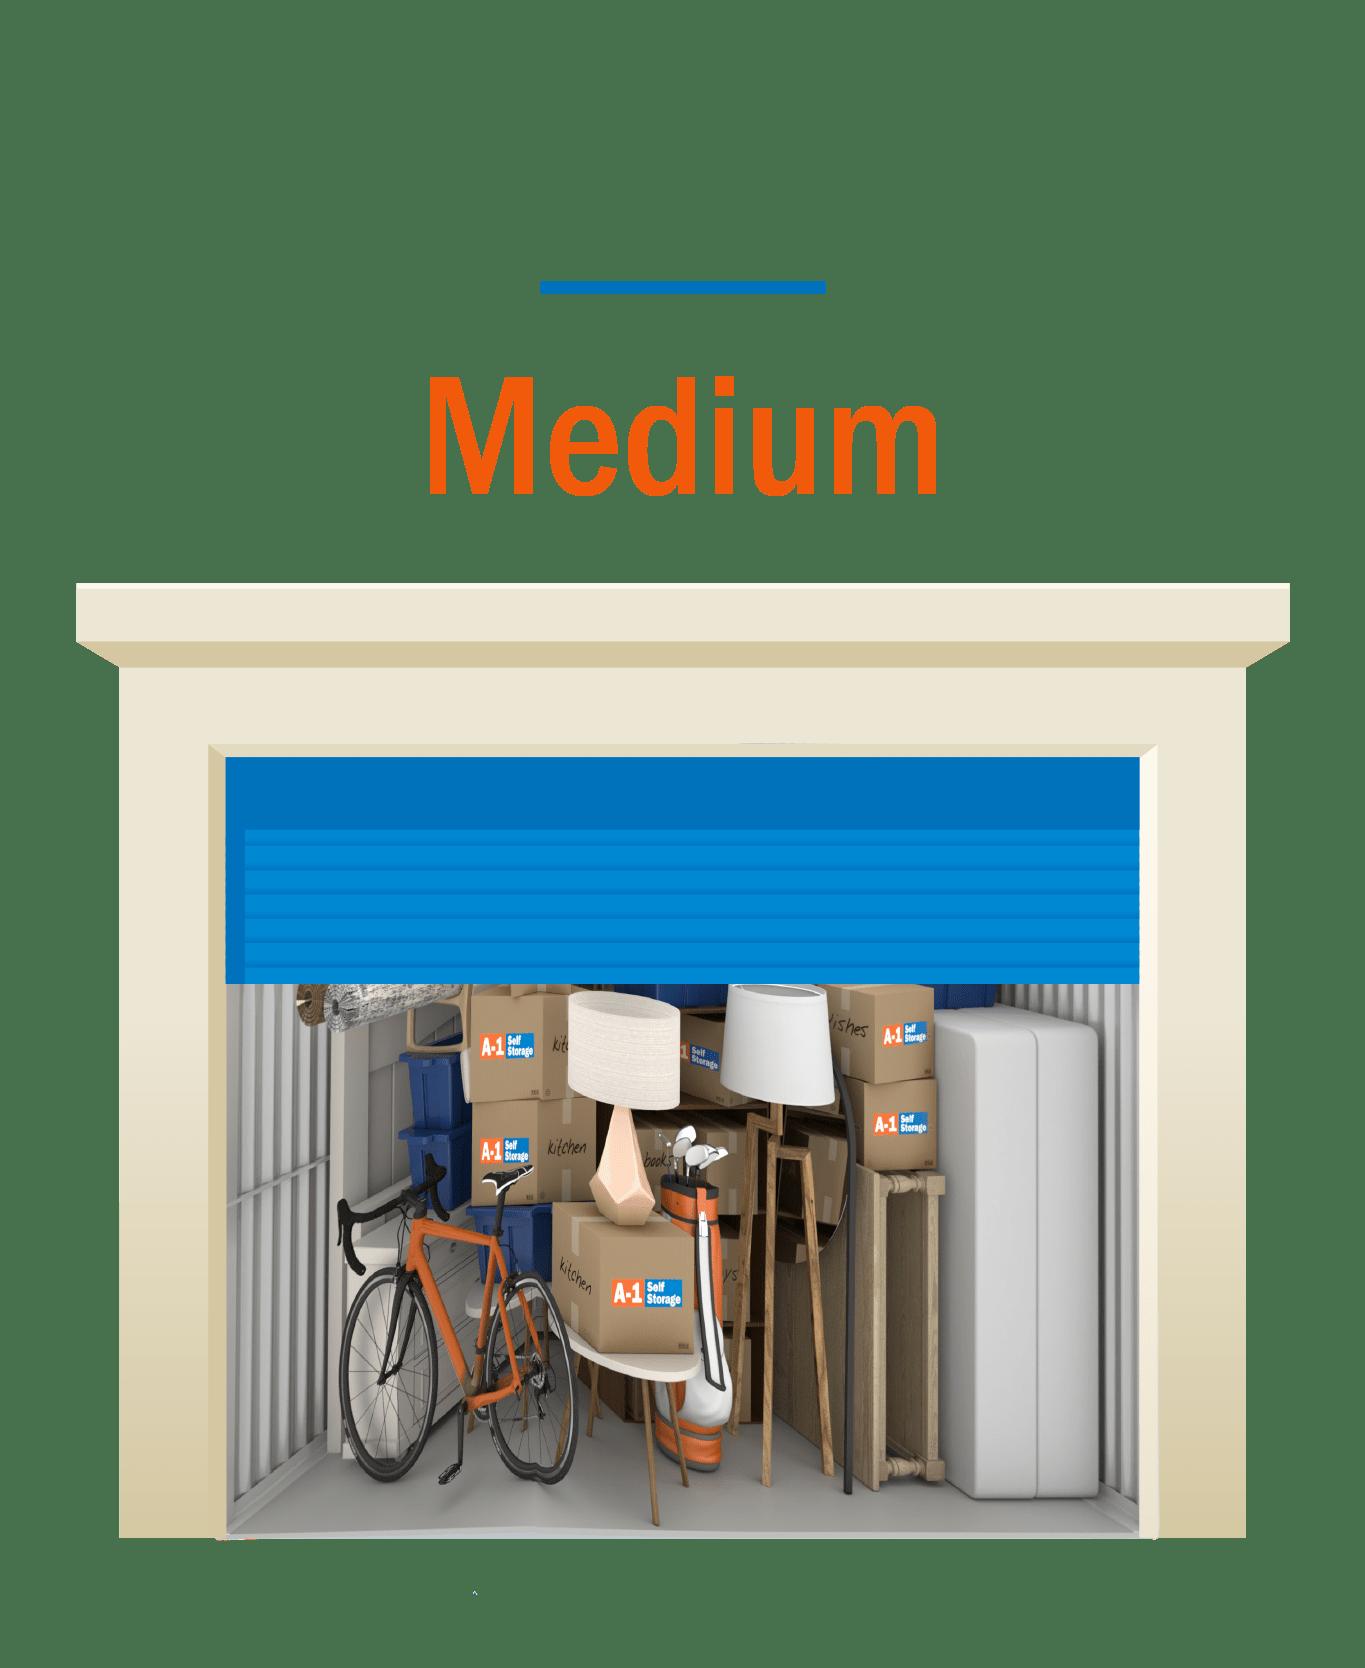 Medium storage unit graphic with door open